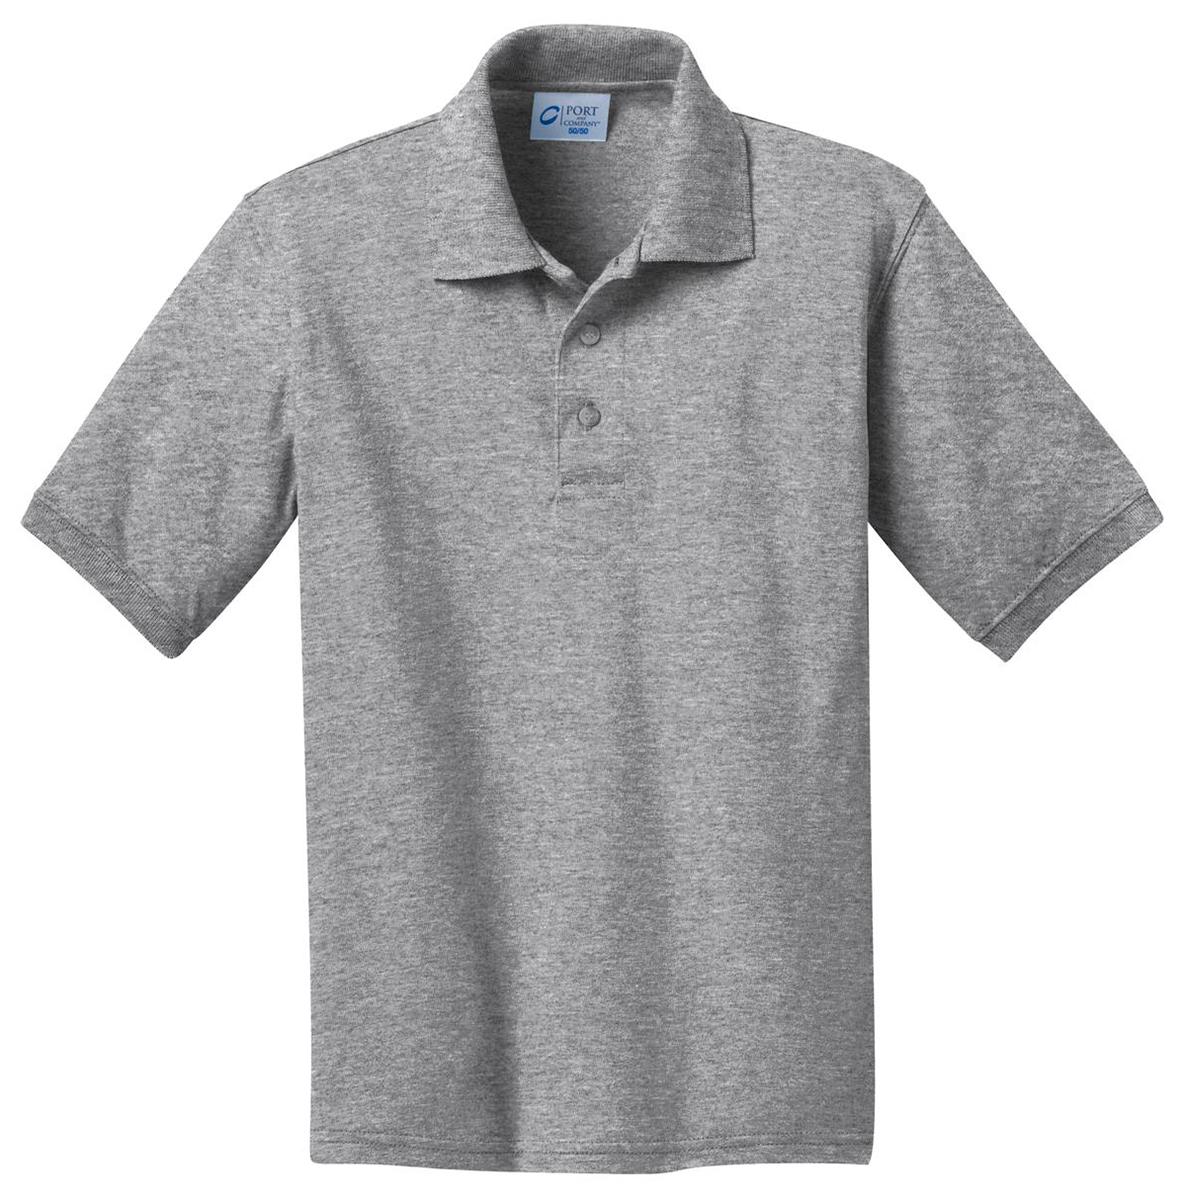 Port Company Boys Youth Jersey 3 Button Knit Polo Shirt